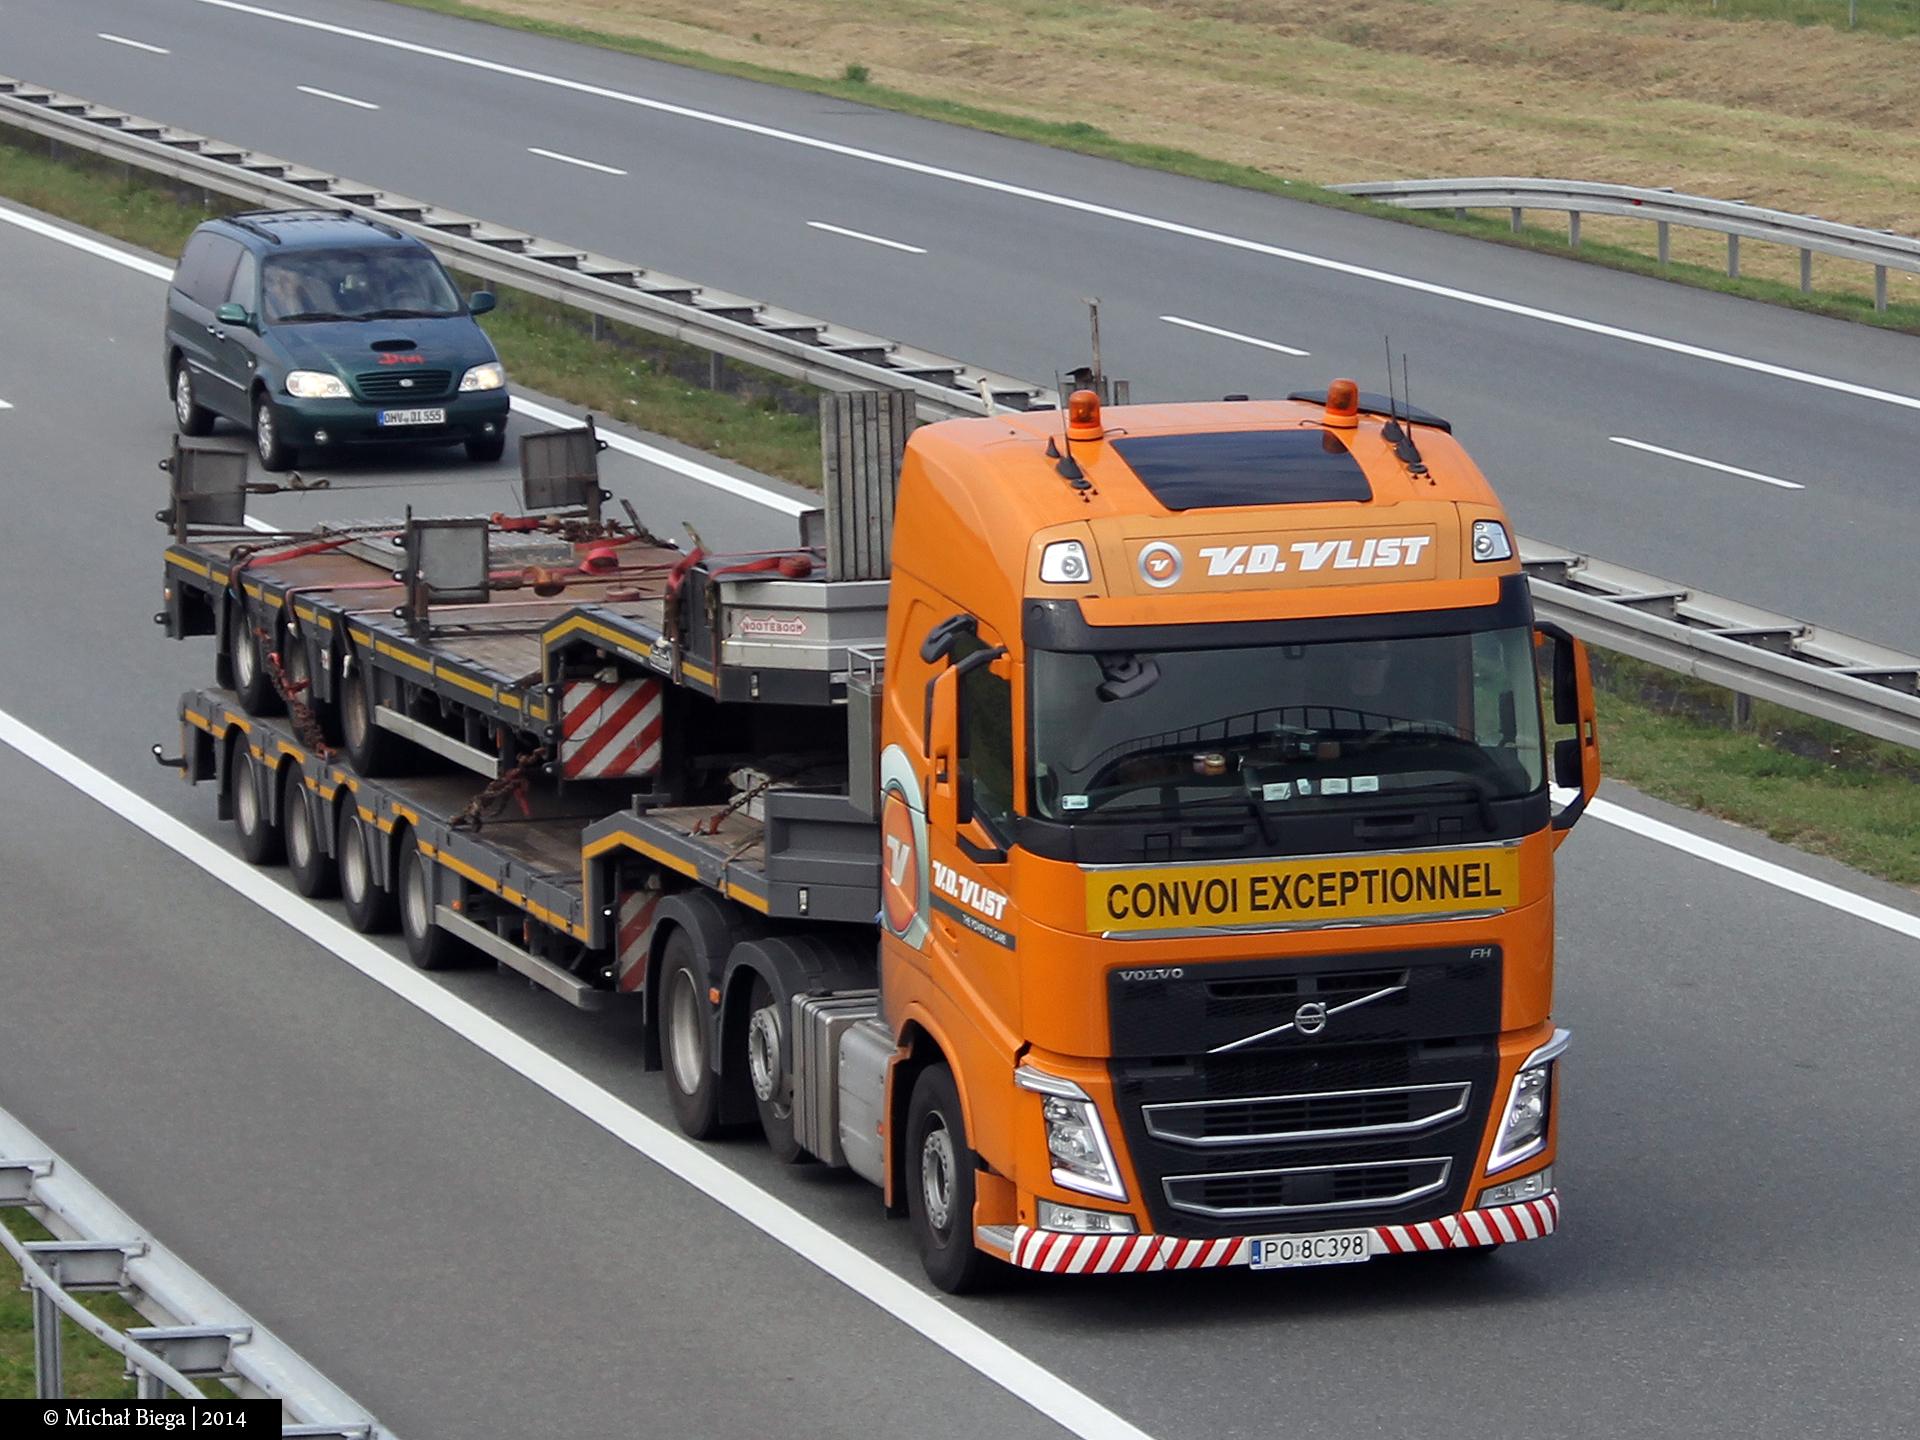 Wallpaper Car Road Volvo Asphalt Truck IV Pl Lane A2 Automotive Exterior Motor Vehicle Mode Of Transport Commercial Trailer